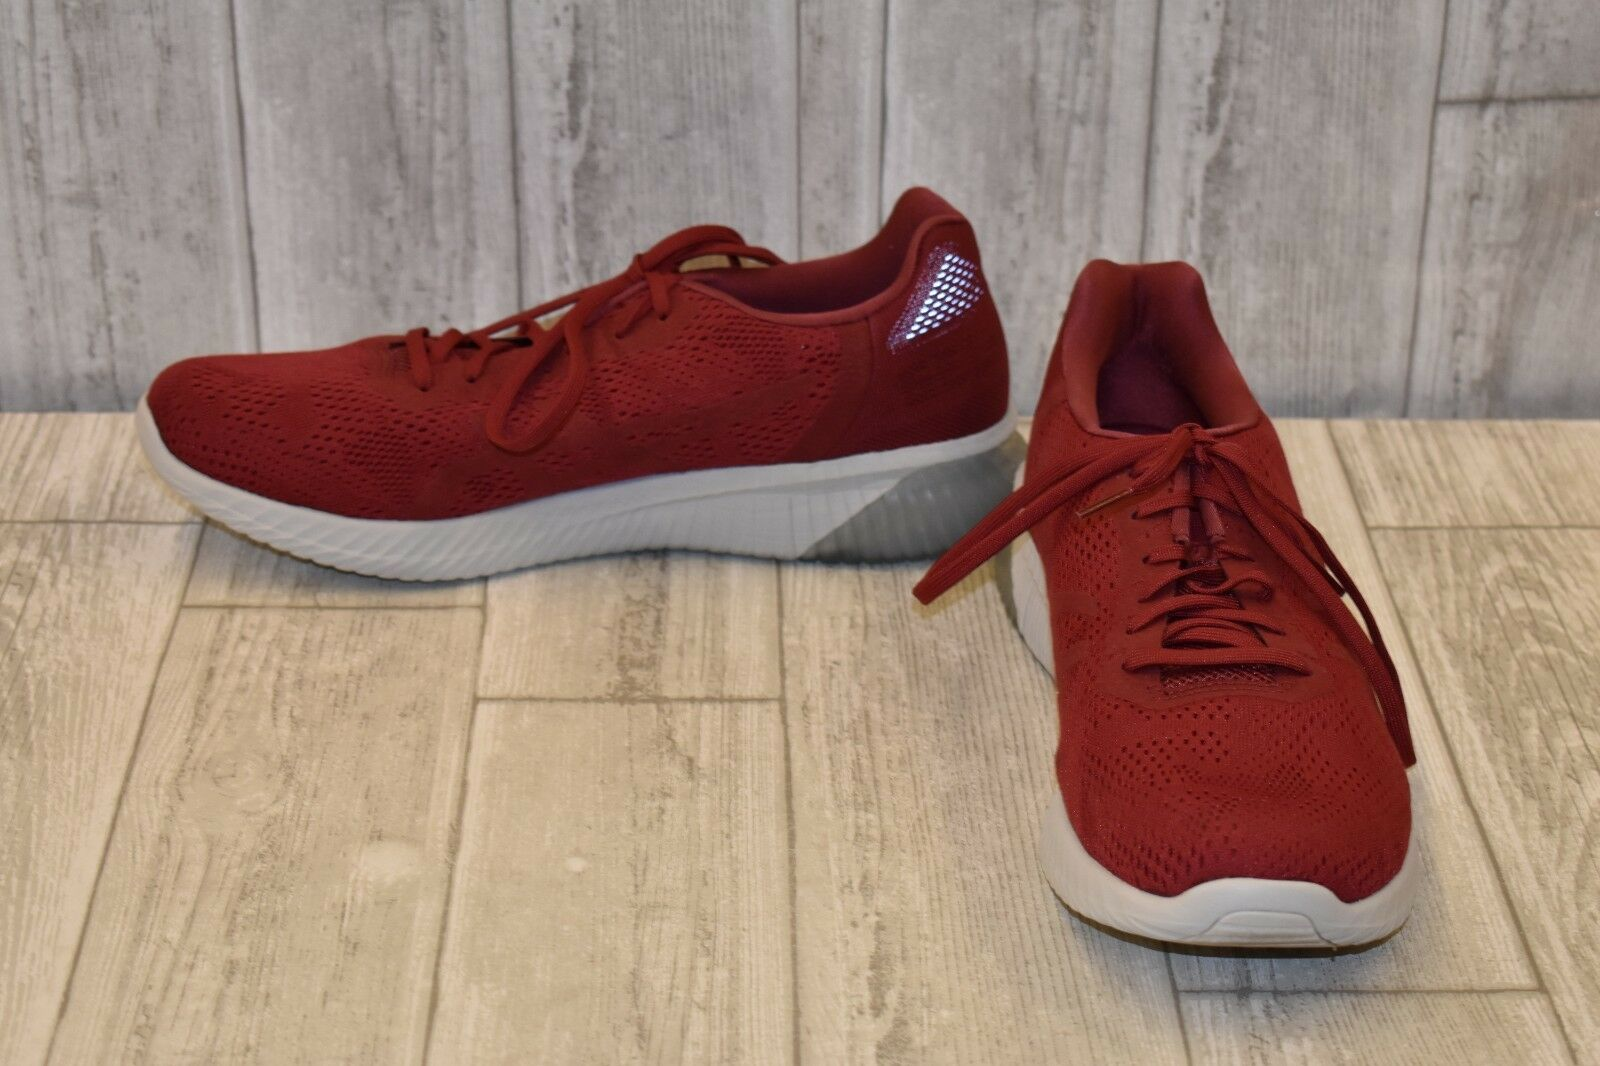 ASICS GEL-Kenun MX Running shoes-Men's size 11 Burgundy